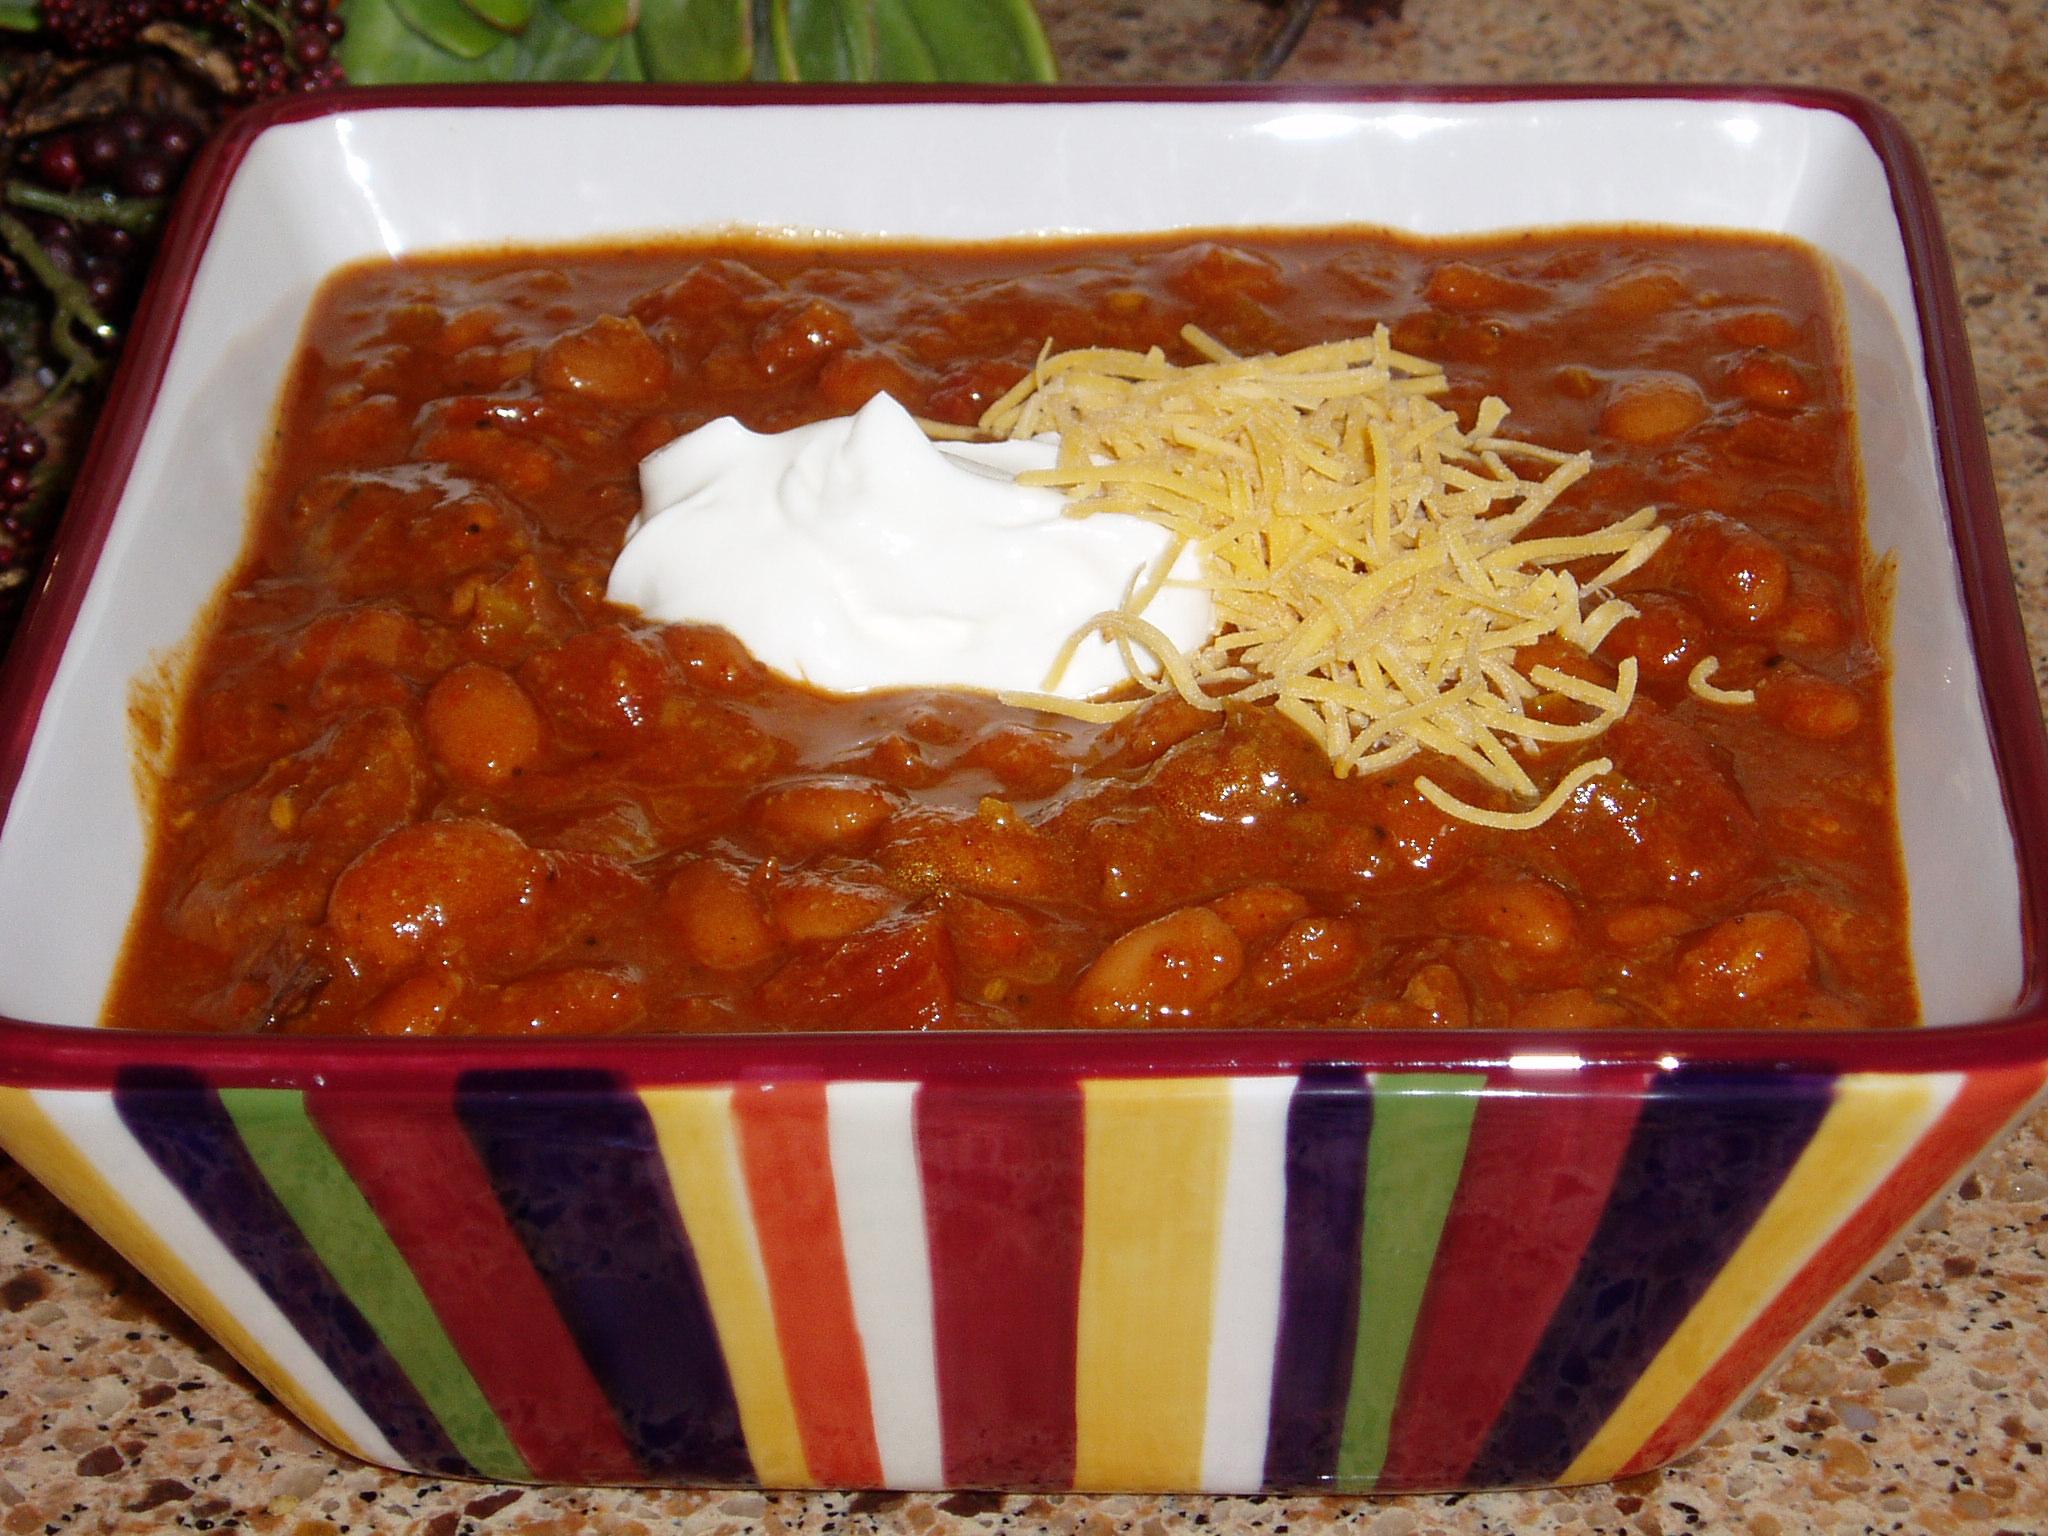 Crock Pot Chili Chili and Beans